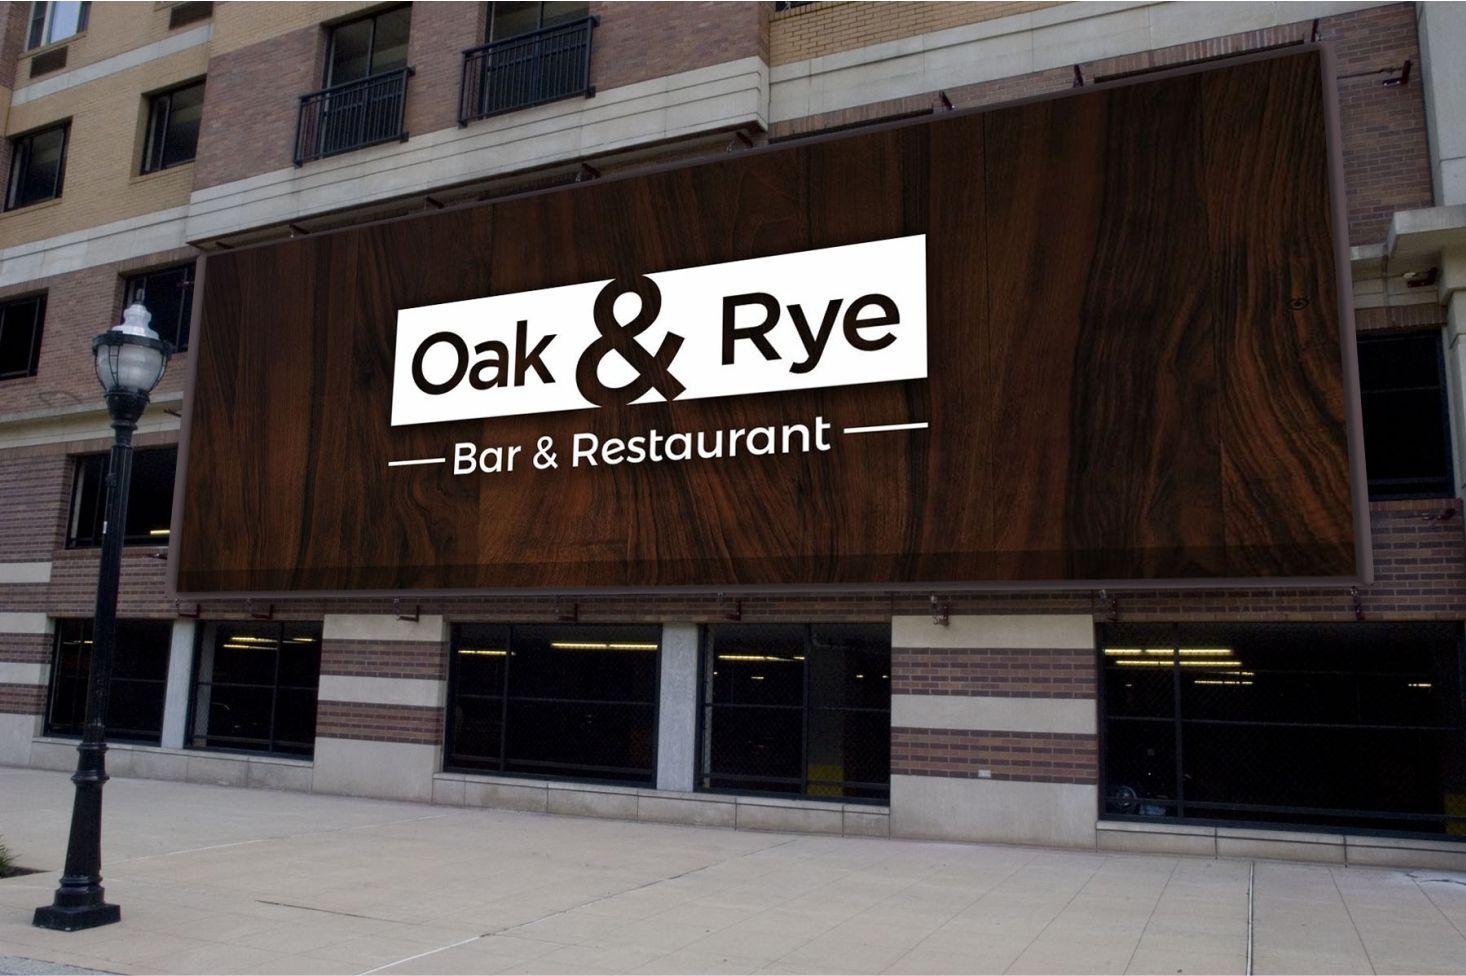 Bold Modern Restaurant Logo Design For Oak Rye Or Oak And Rye By Graphic Media Design 12212891